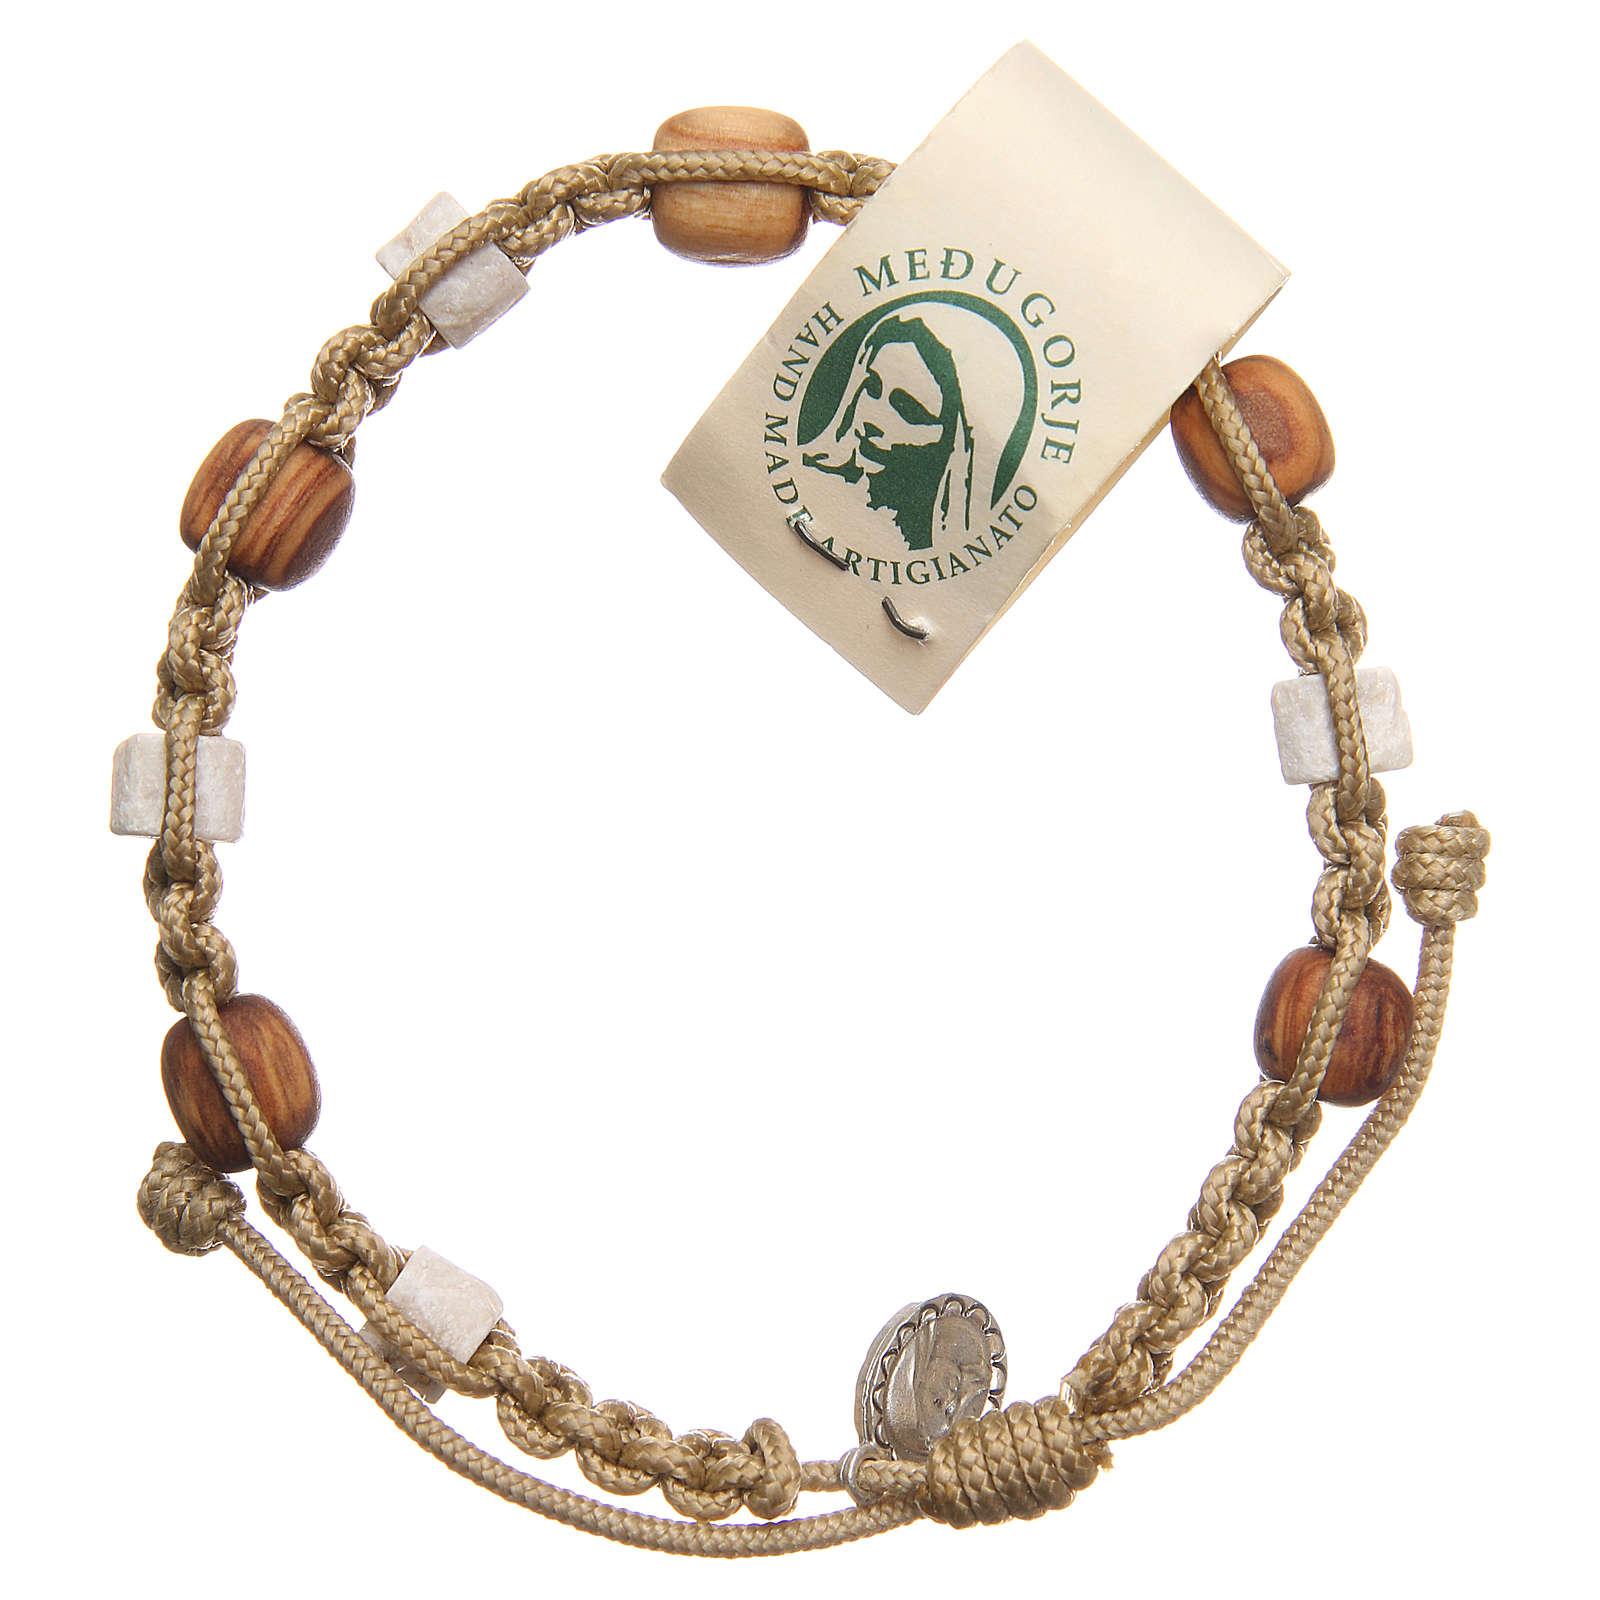 Bracelet bois olivier pierre blanche Medjugorje beige 4